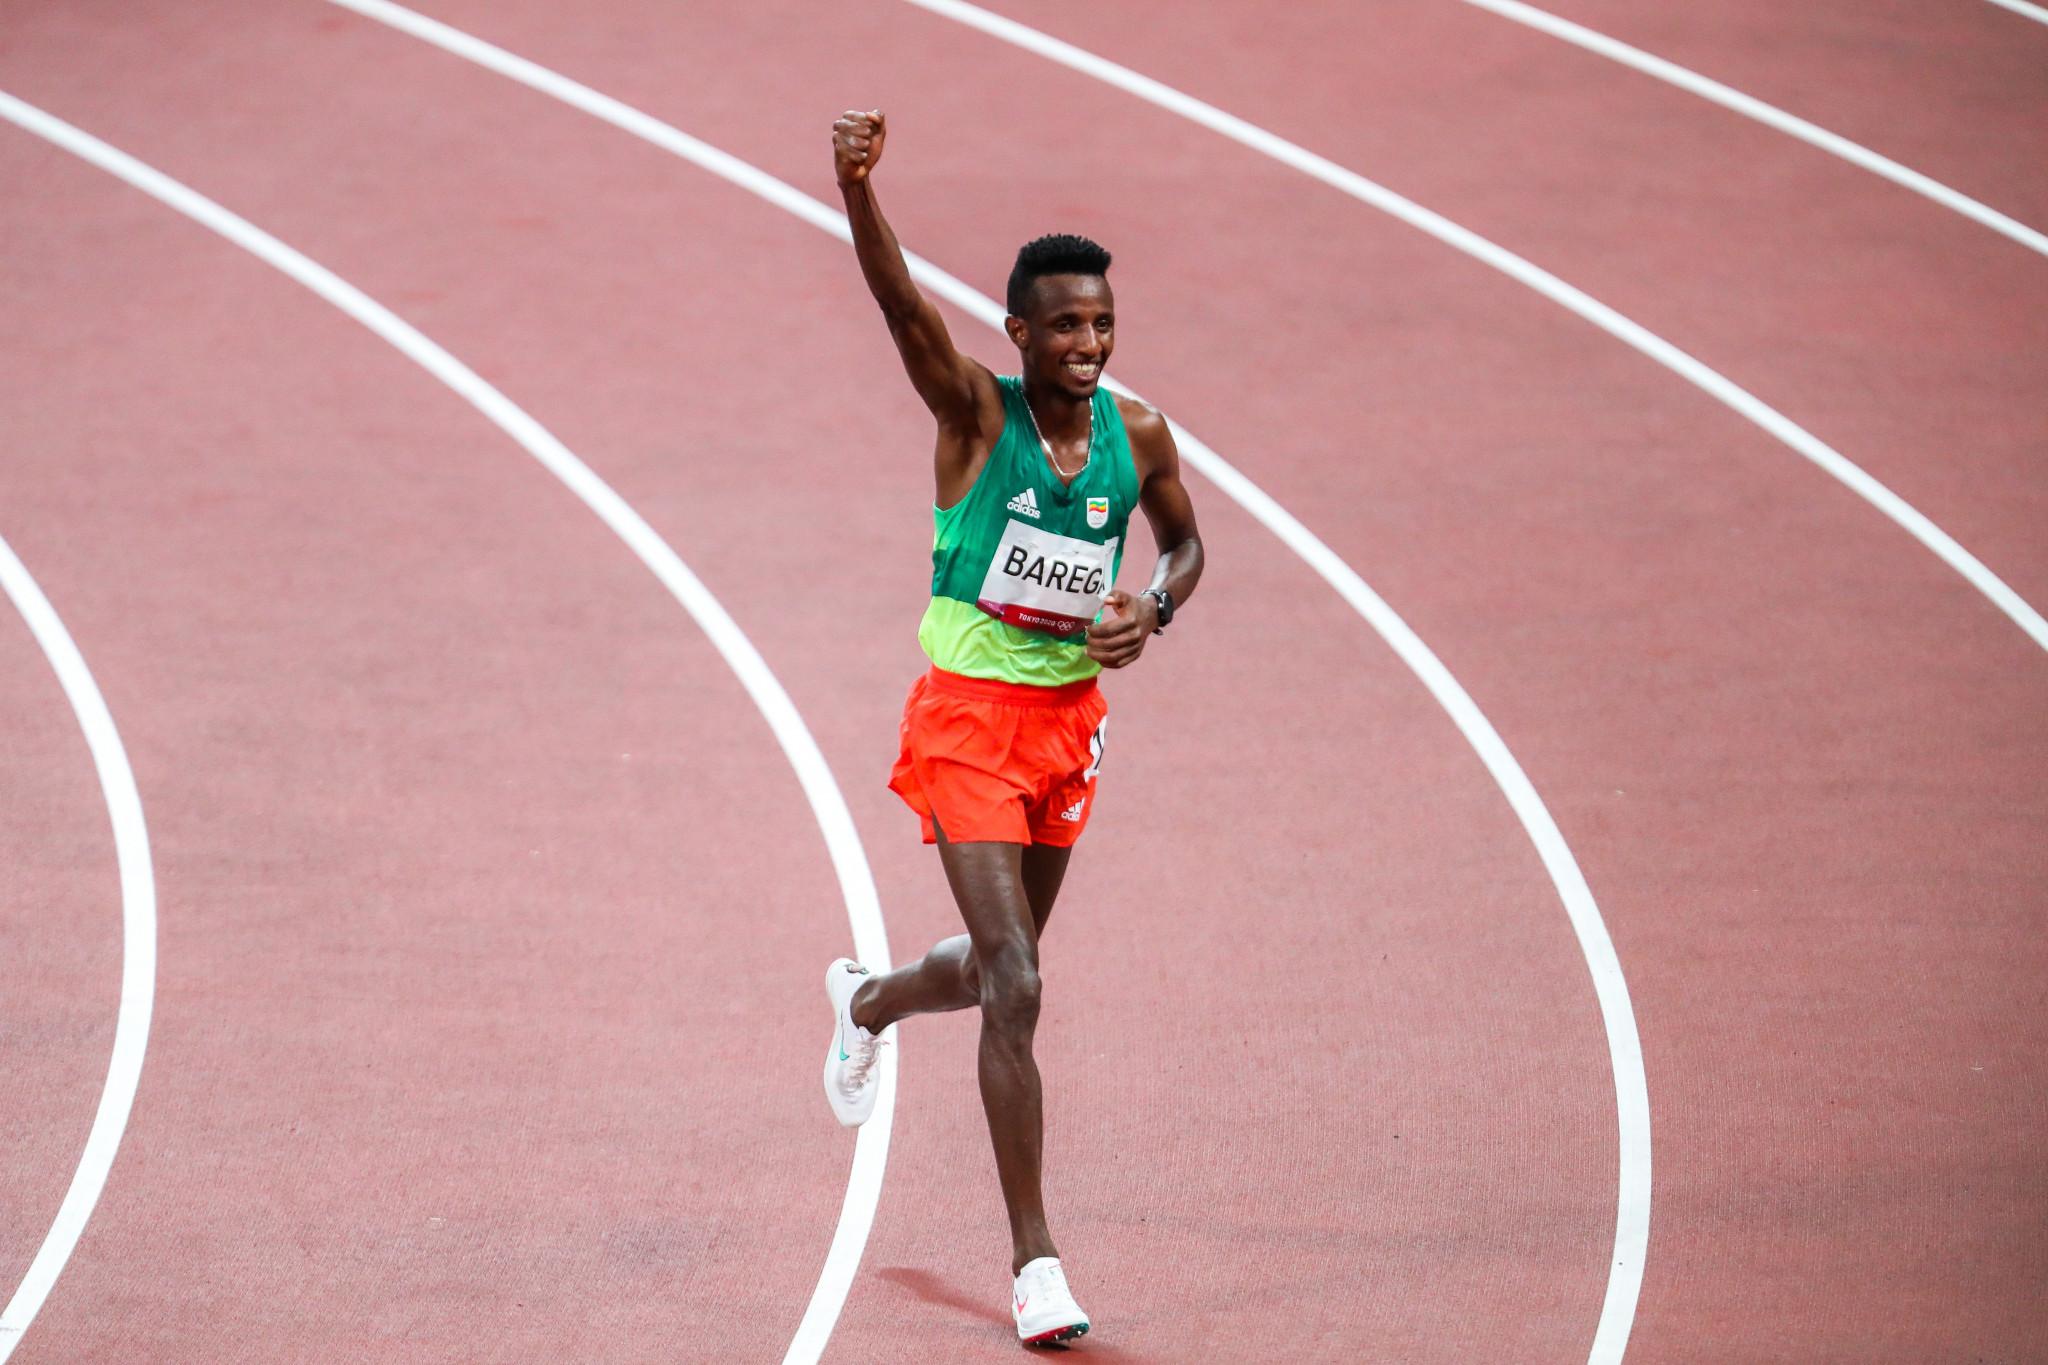 Selemon Barega of Ethiopia won the first athletics gold of Tokyo 2020, winning the men's 10,000 metres title ©Getty Images